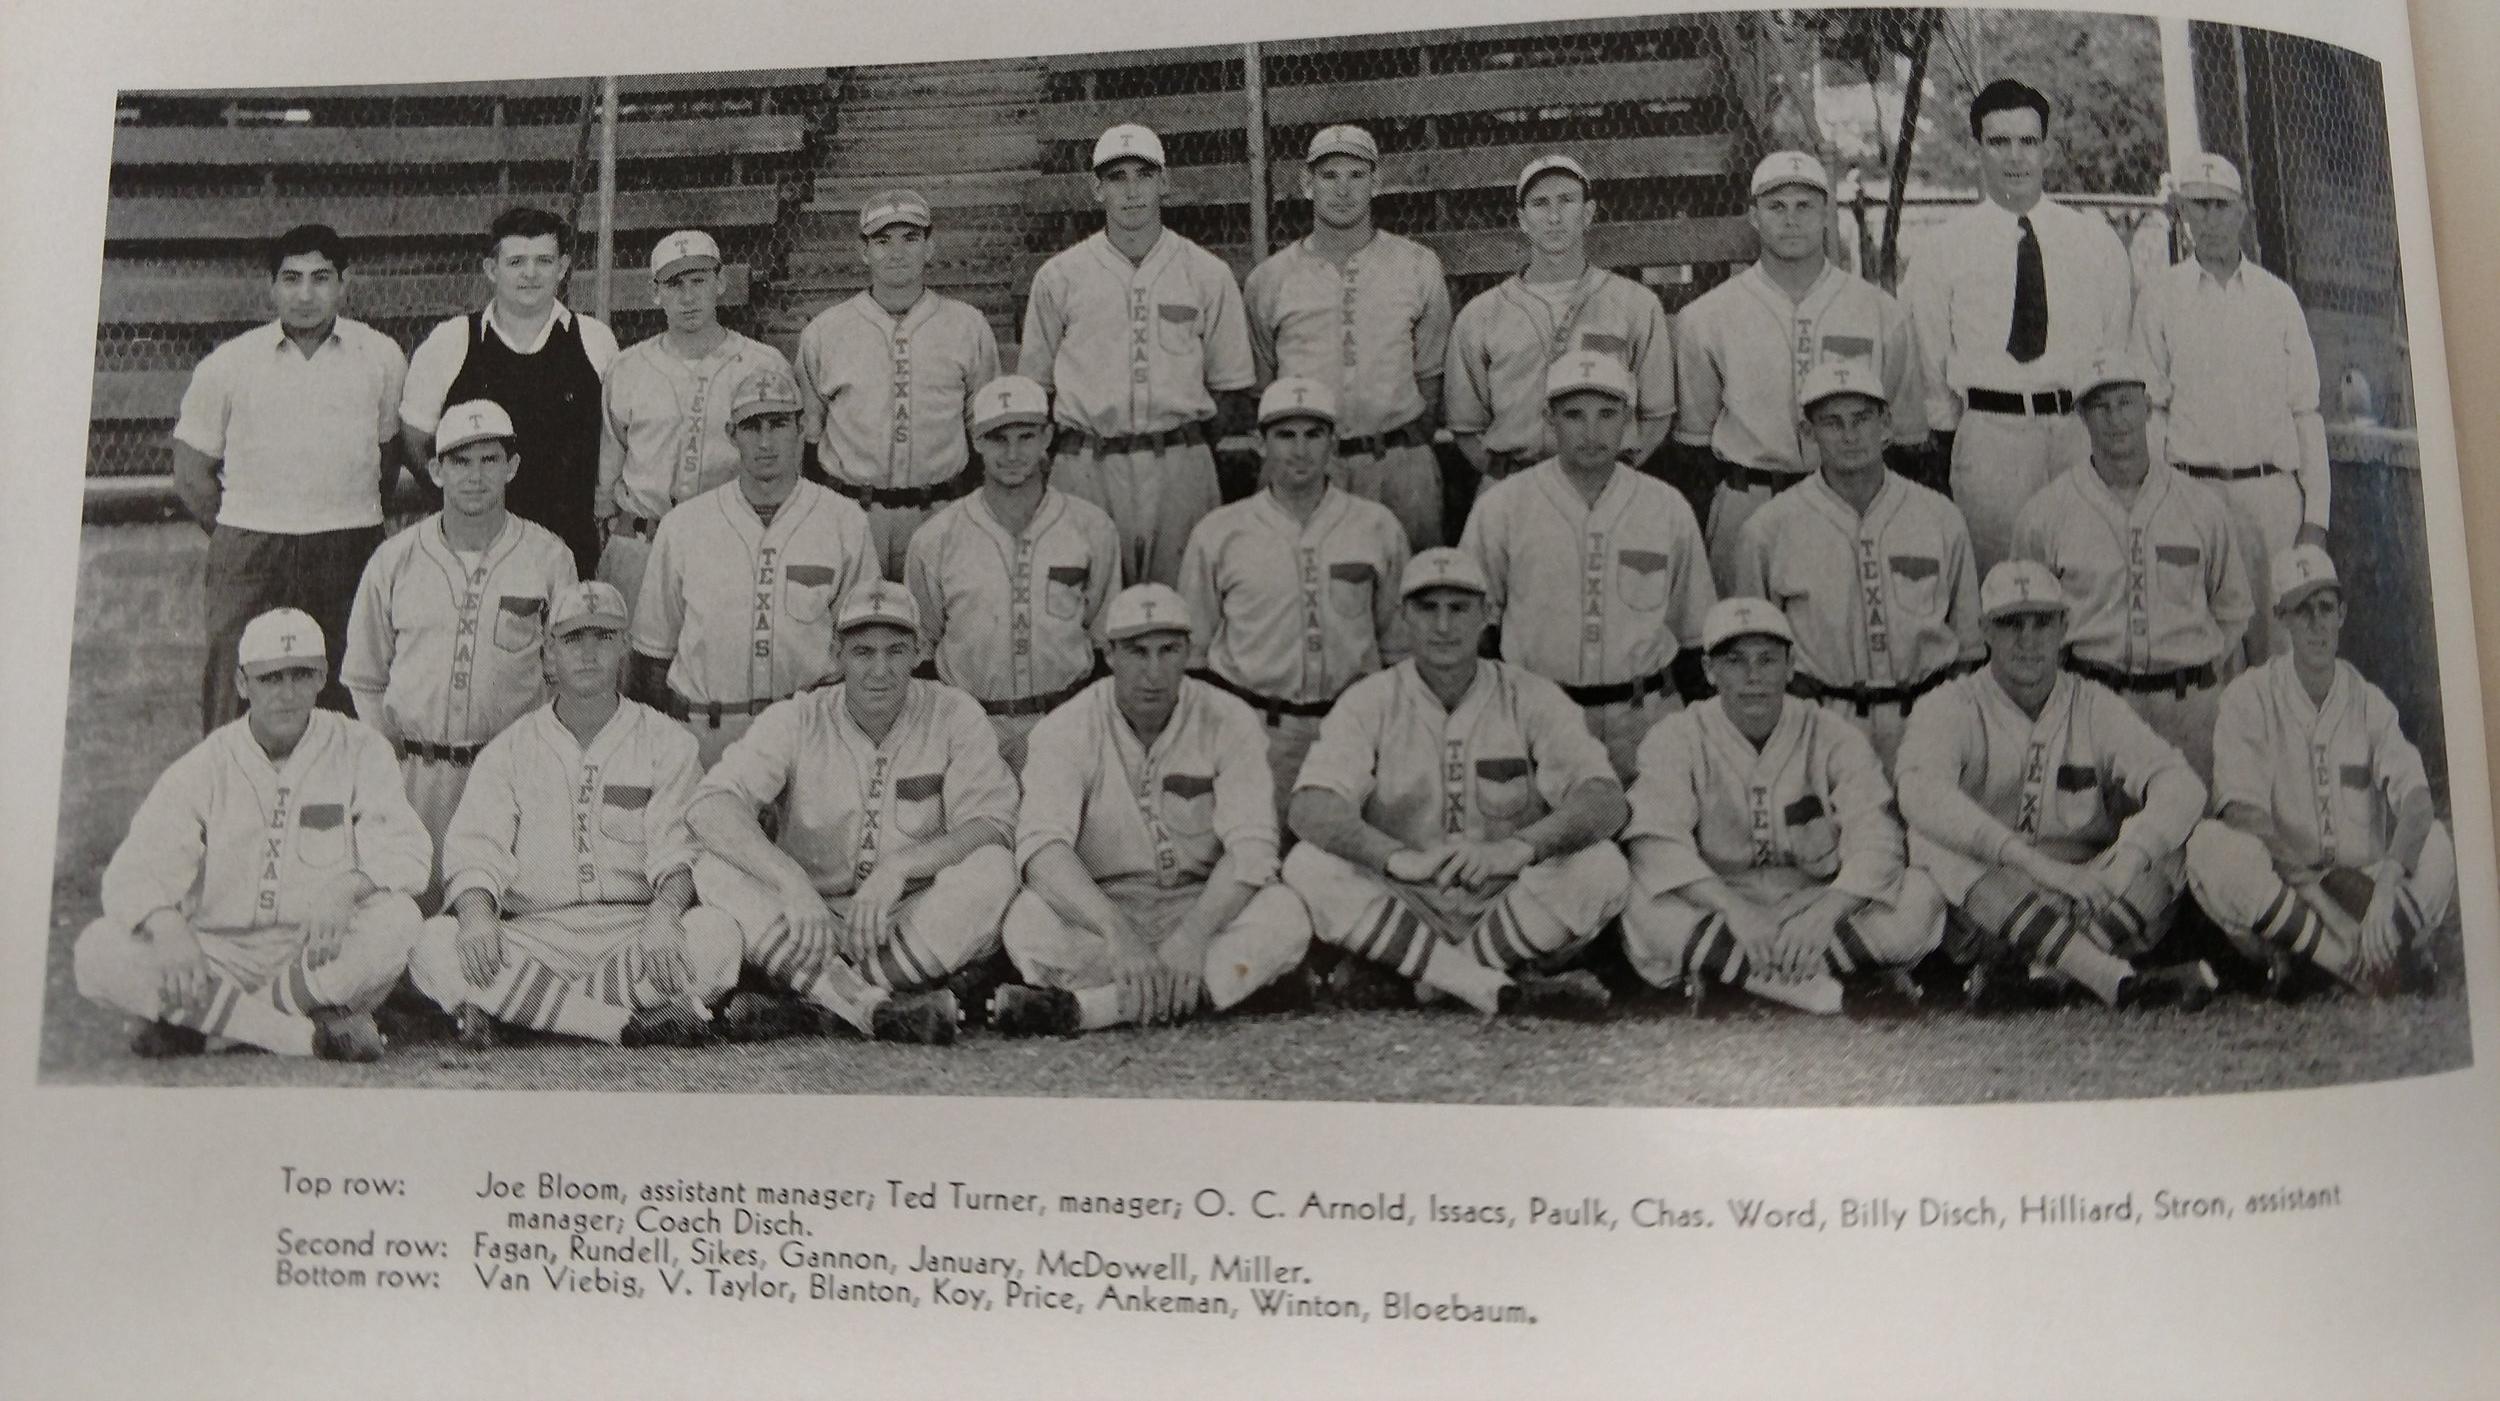 1932 baseball team